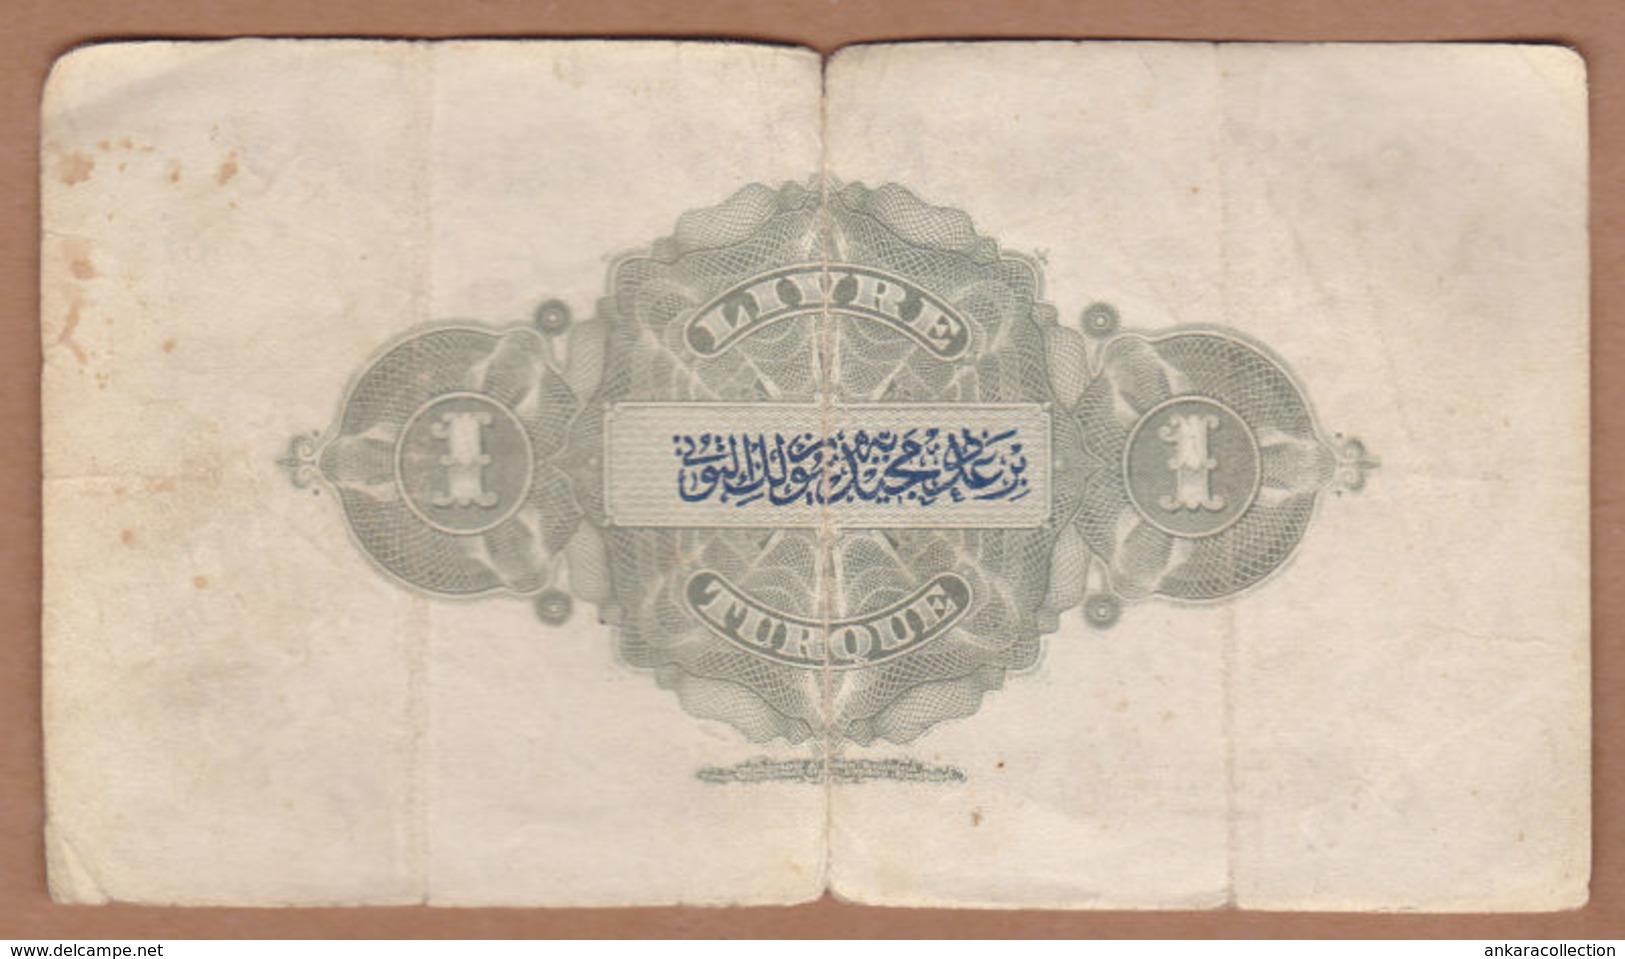 AC - OTTOMAN TURKEY - 1 LIVRE No 015 14 47 FINE+ MEHMED RESAD 1332 - Turkije